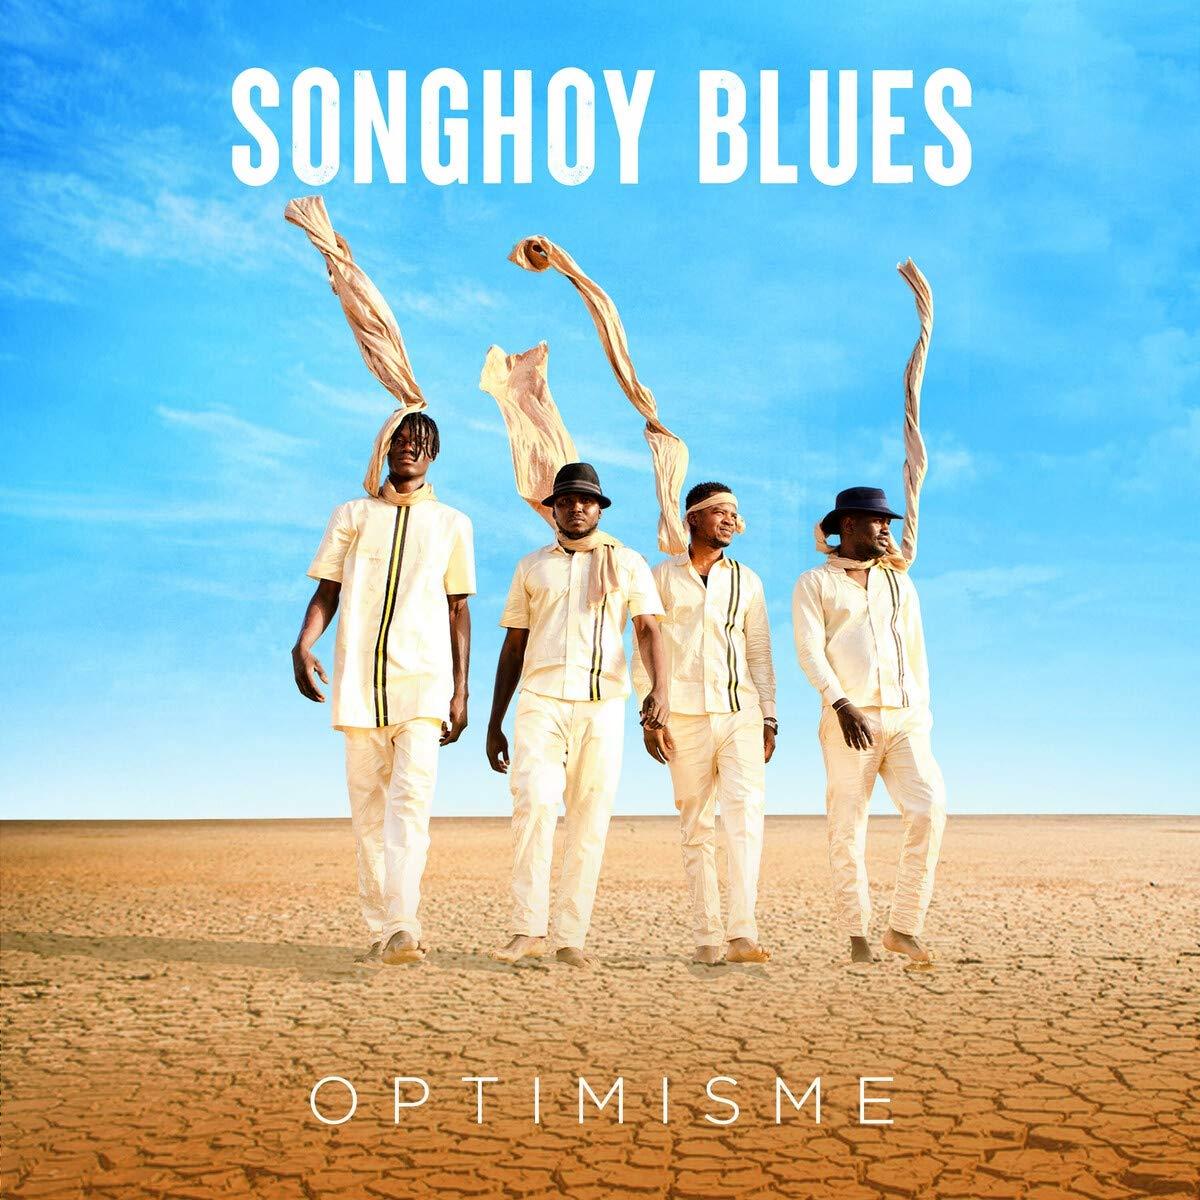 Songhoy_Blues